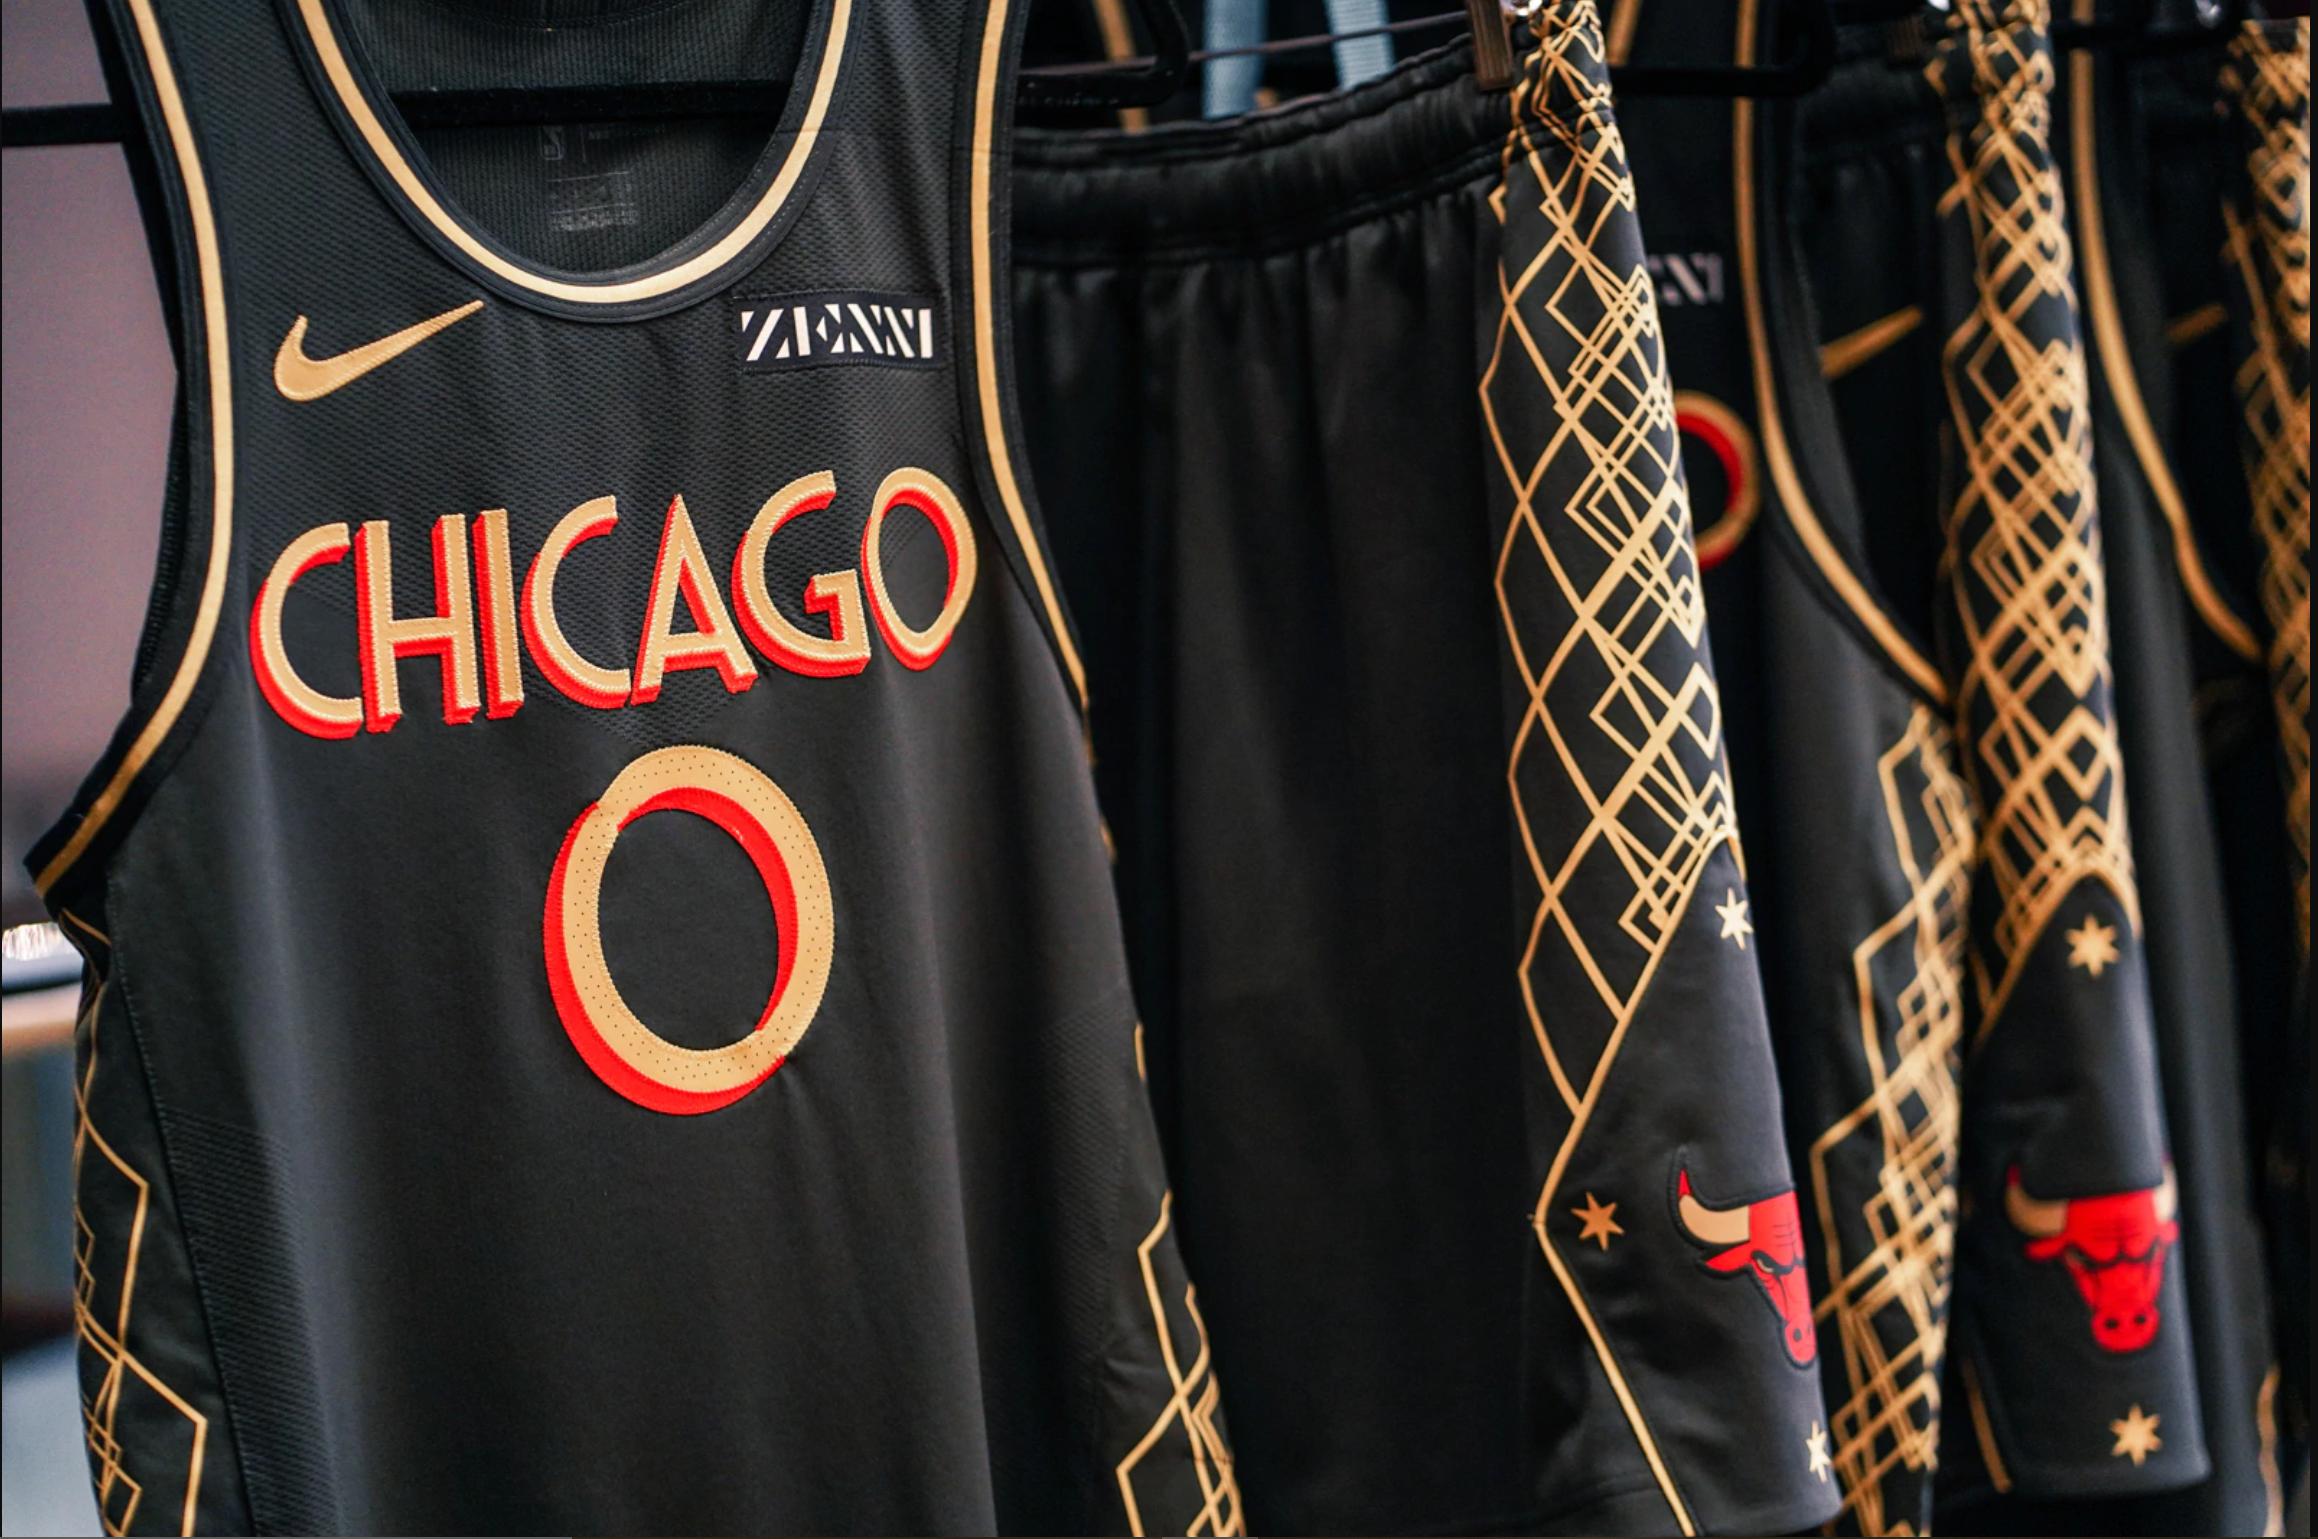 Grading the NBA City Edition Uniforms: Part 2